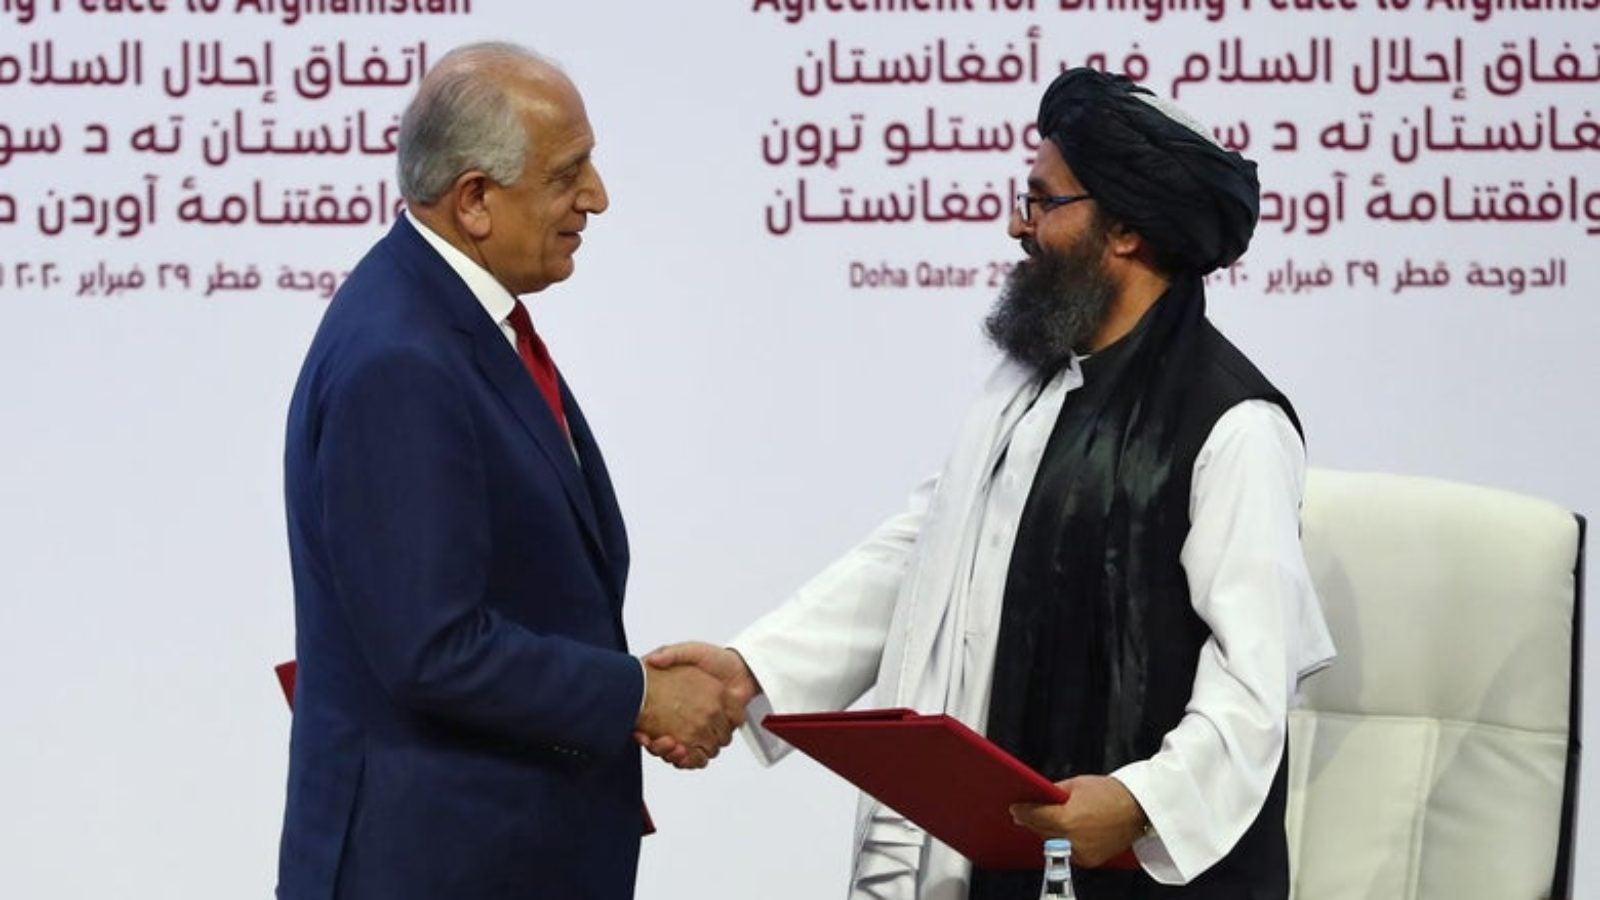 U.S. peace envoy Zalmay Khalilzad, left, and Mullah Abdul Ghani Baradar, the Taliban's top political leader, shake hands after signing a peace agreement between Taliban and U.S. officials in Doha, Qatar.